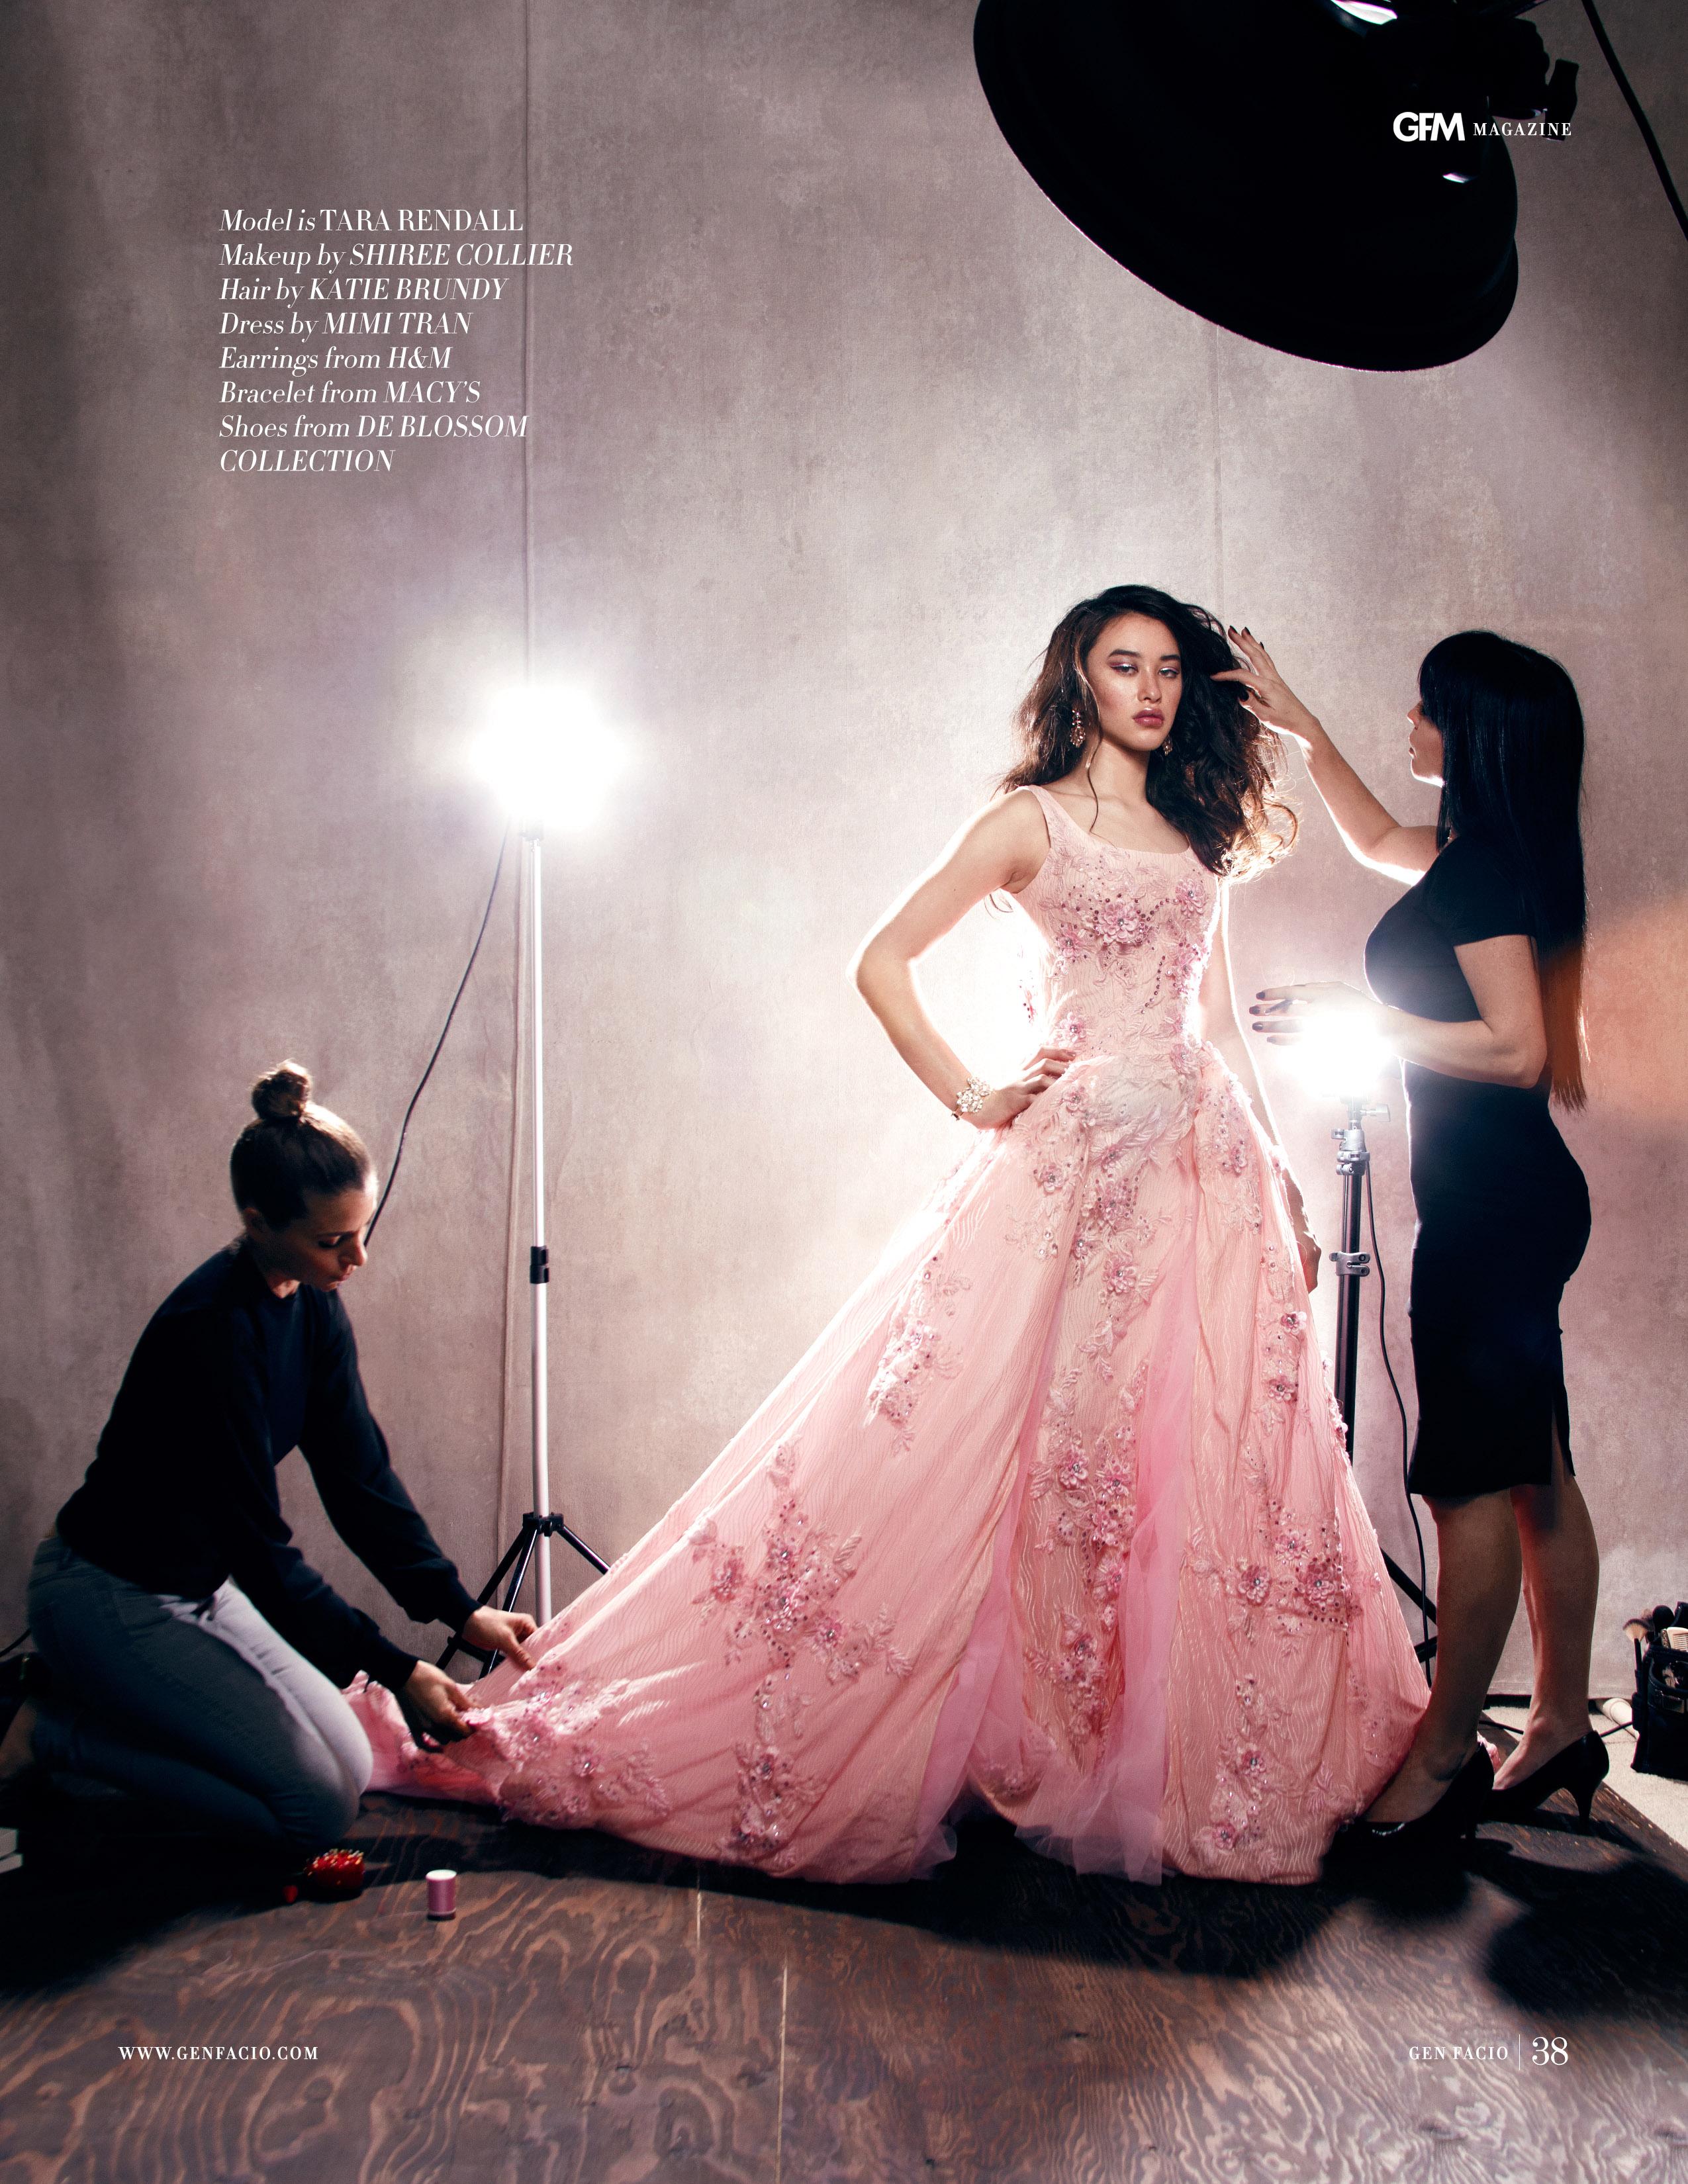 vanity-seven-deadly-sins-fashion-editorial-melbourne-makeup-hair